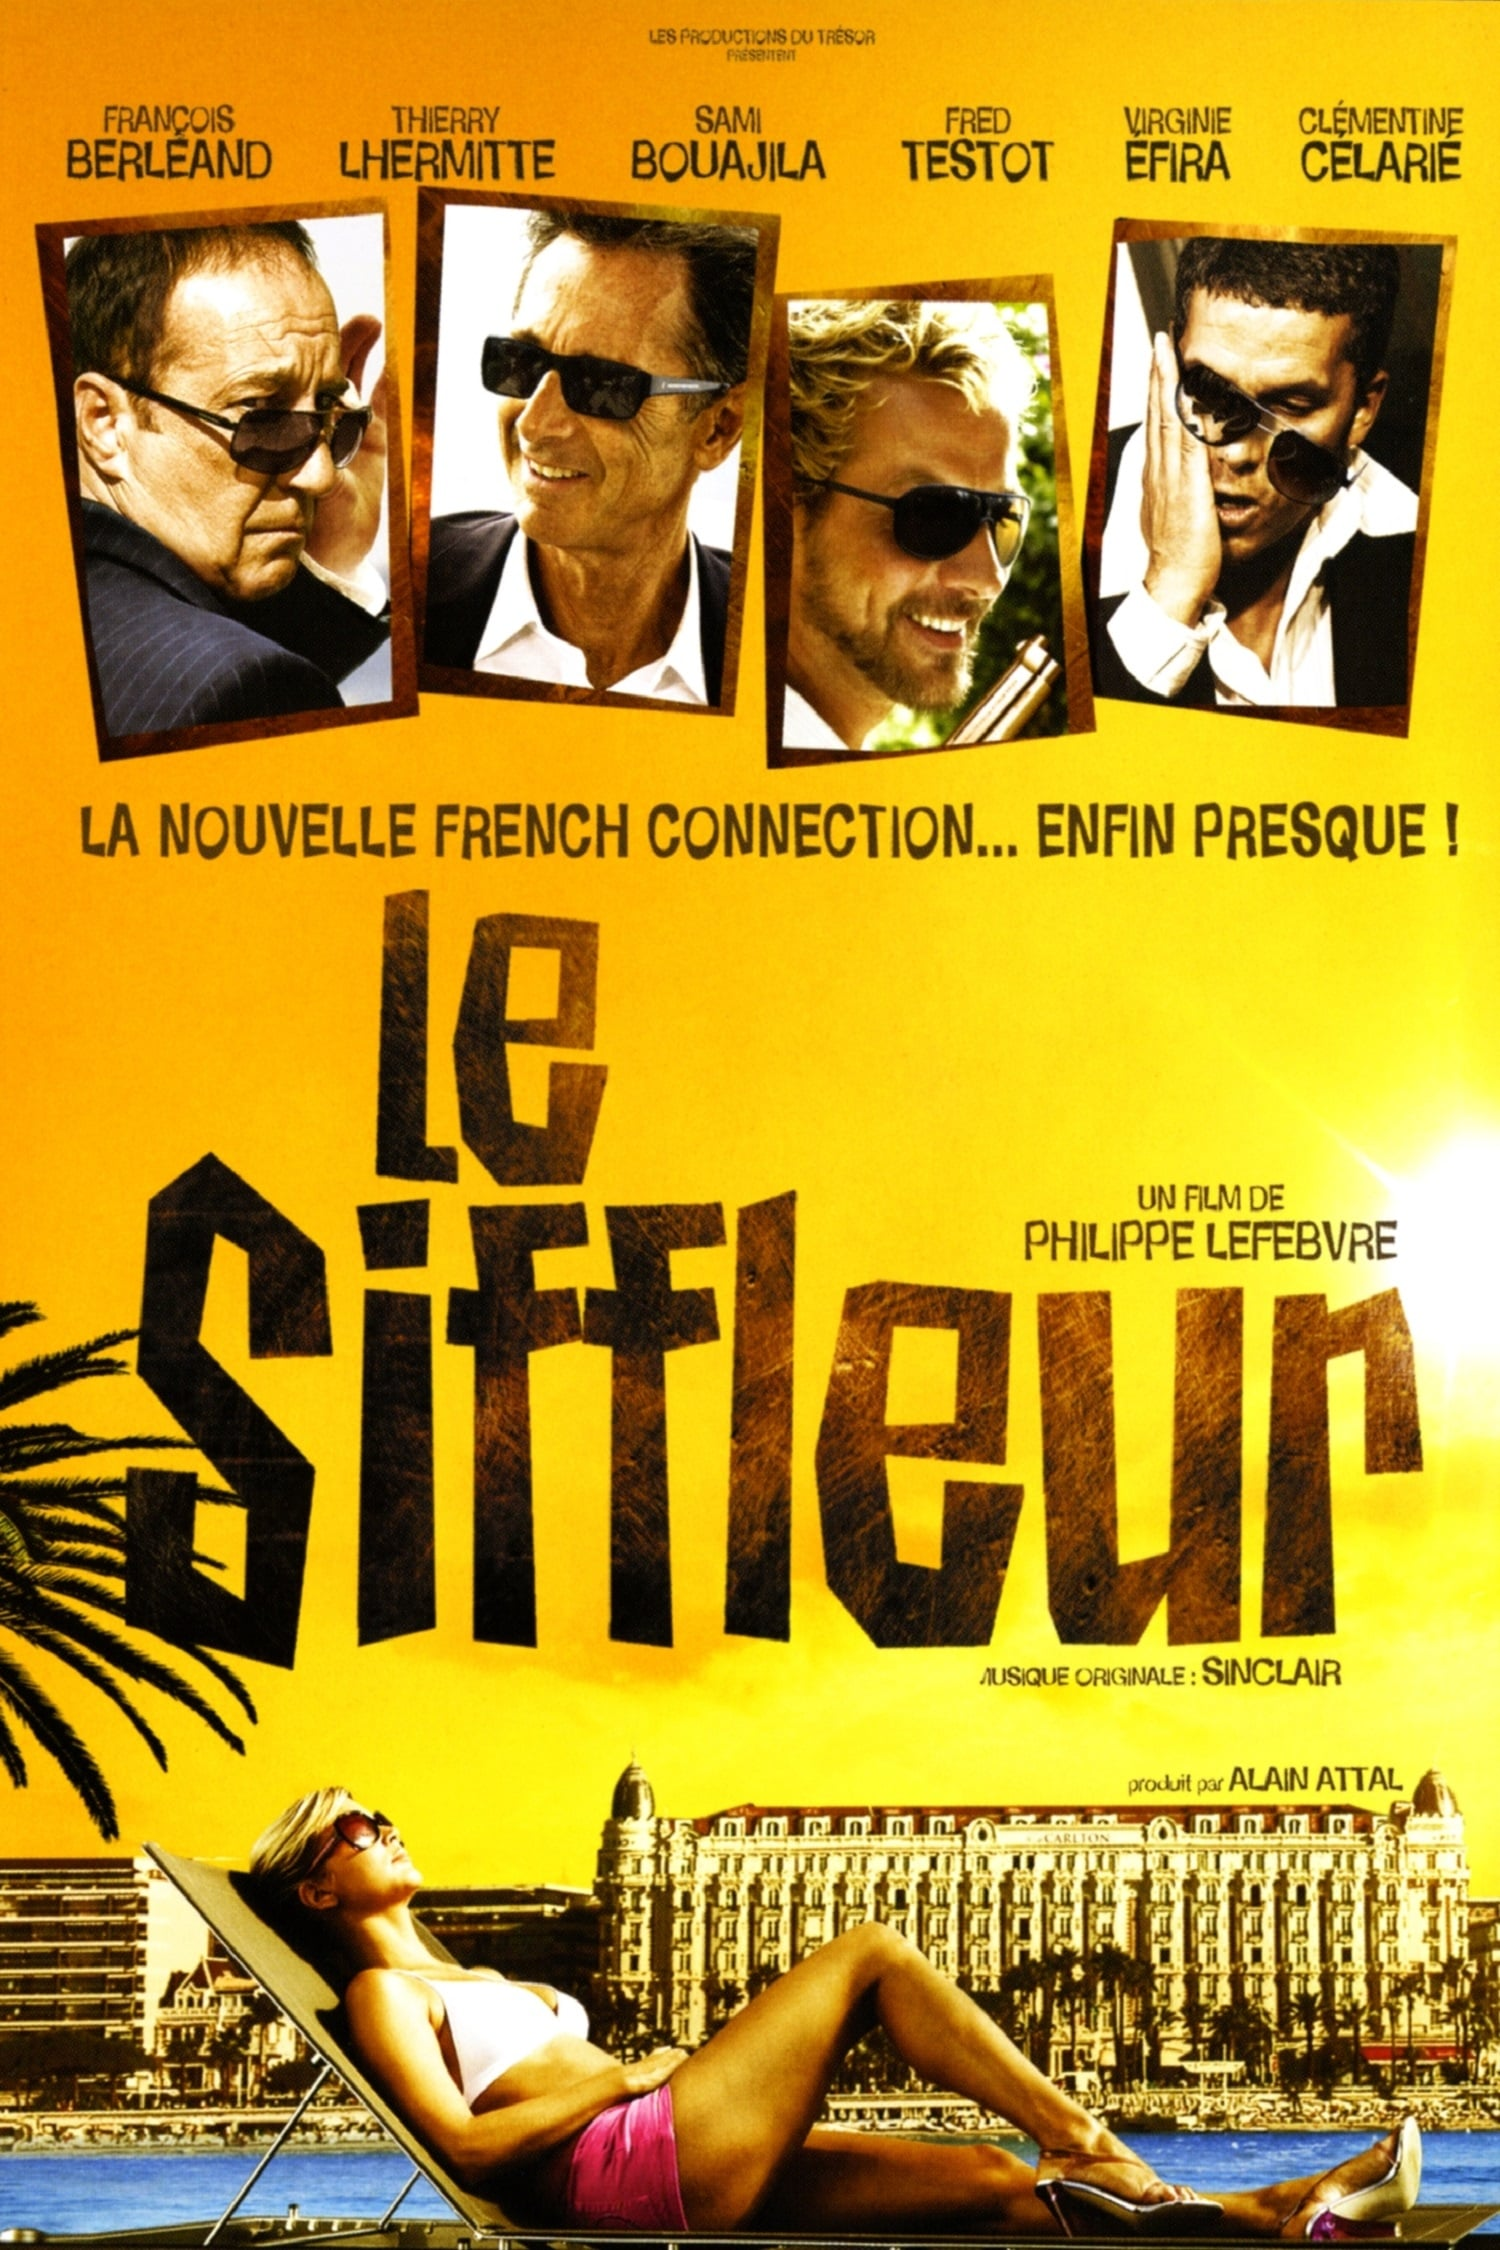 Film le siffleur 2010 en streaming vf complet filmstreaming hd com - Le jardin secret streaming ...